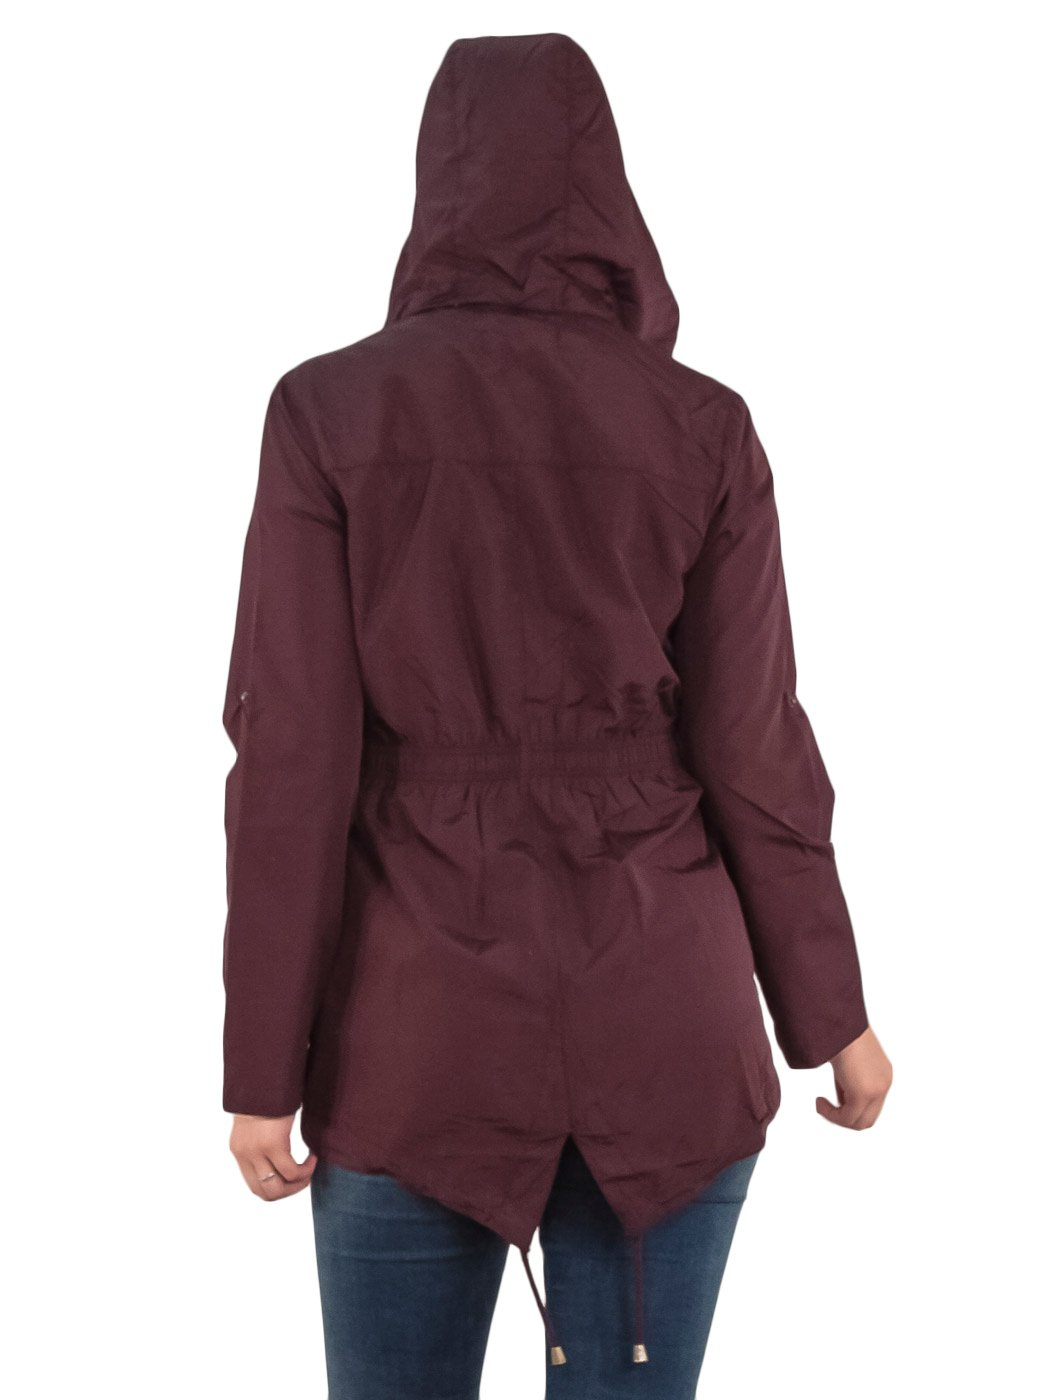 Womens-RainCoat-Plain-Hooded-Ladies-Jacket-Kagool-Parka-Long-Sleeves-Two-Pockets thumbnail 16